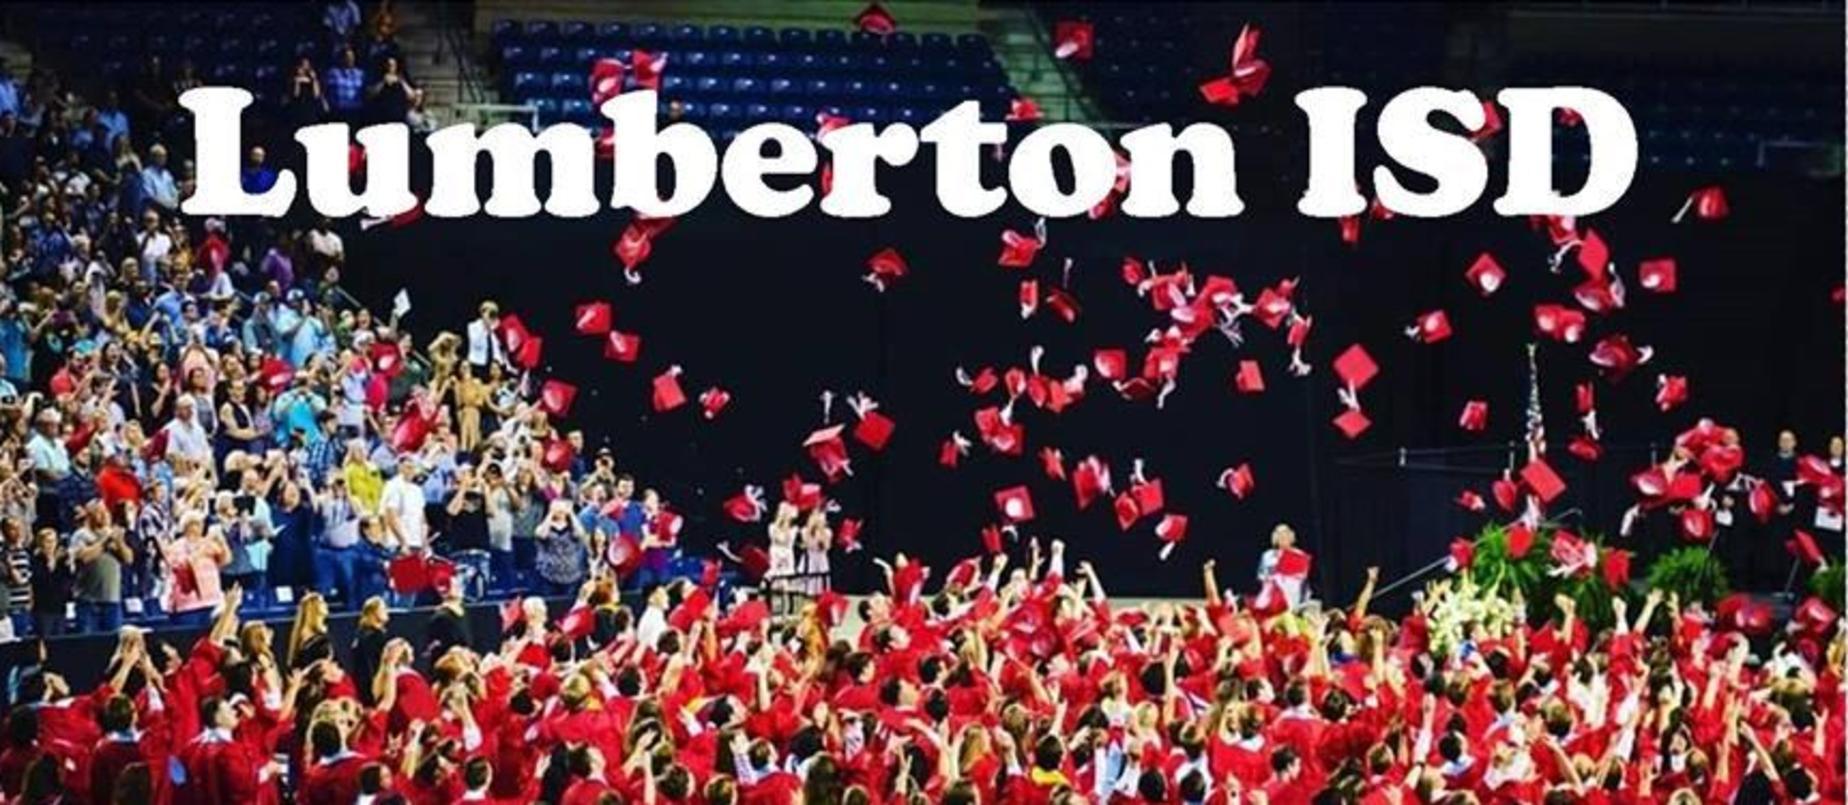 LHS 2019 Graduation